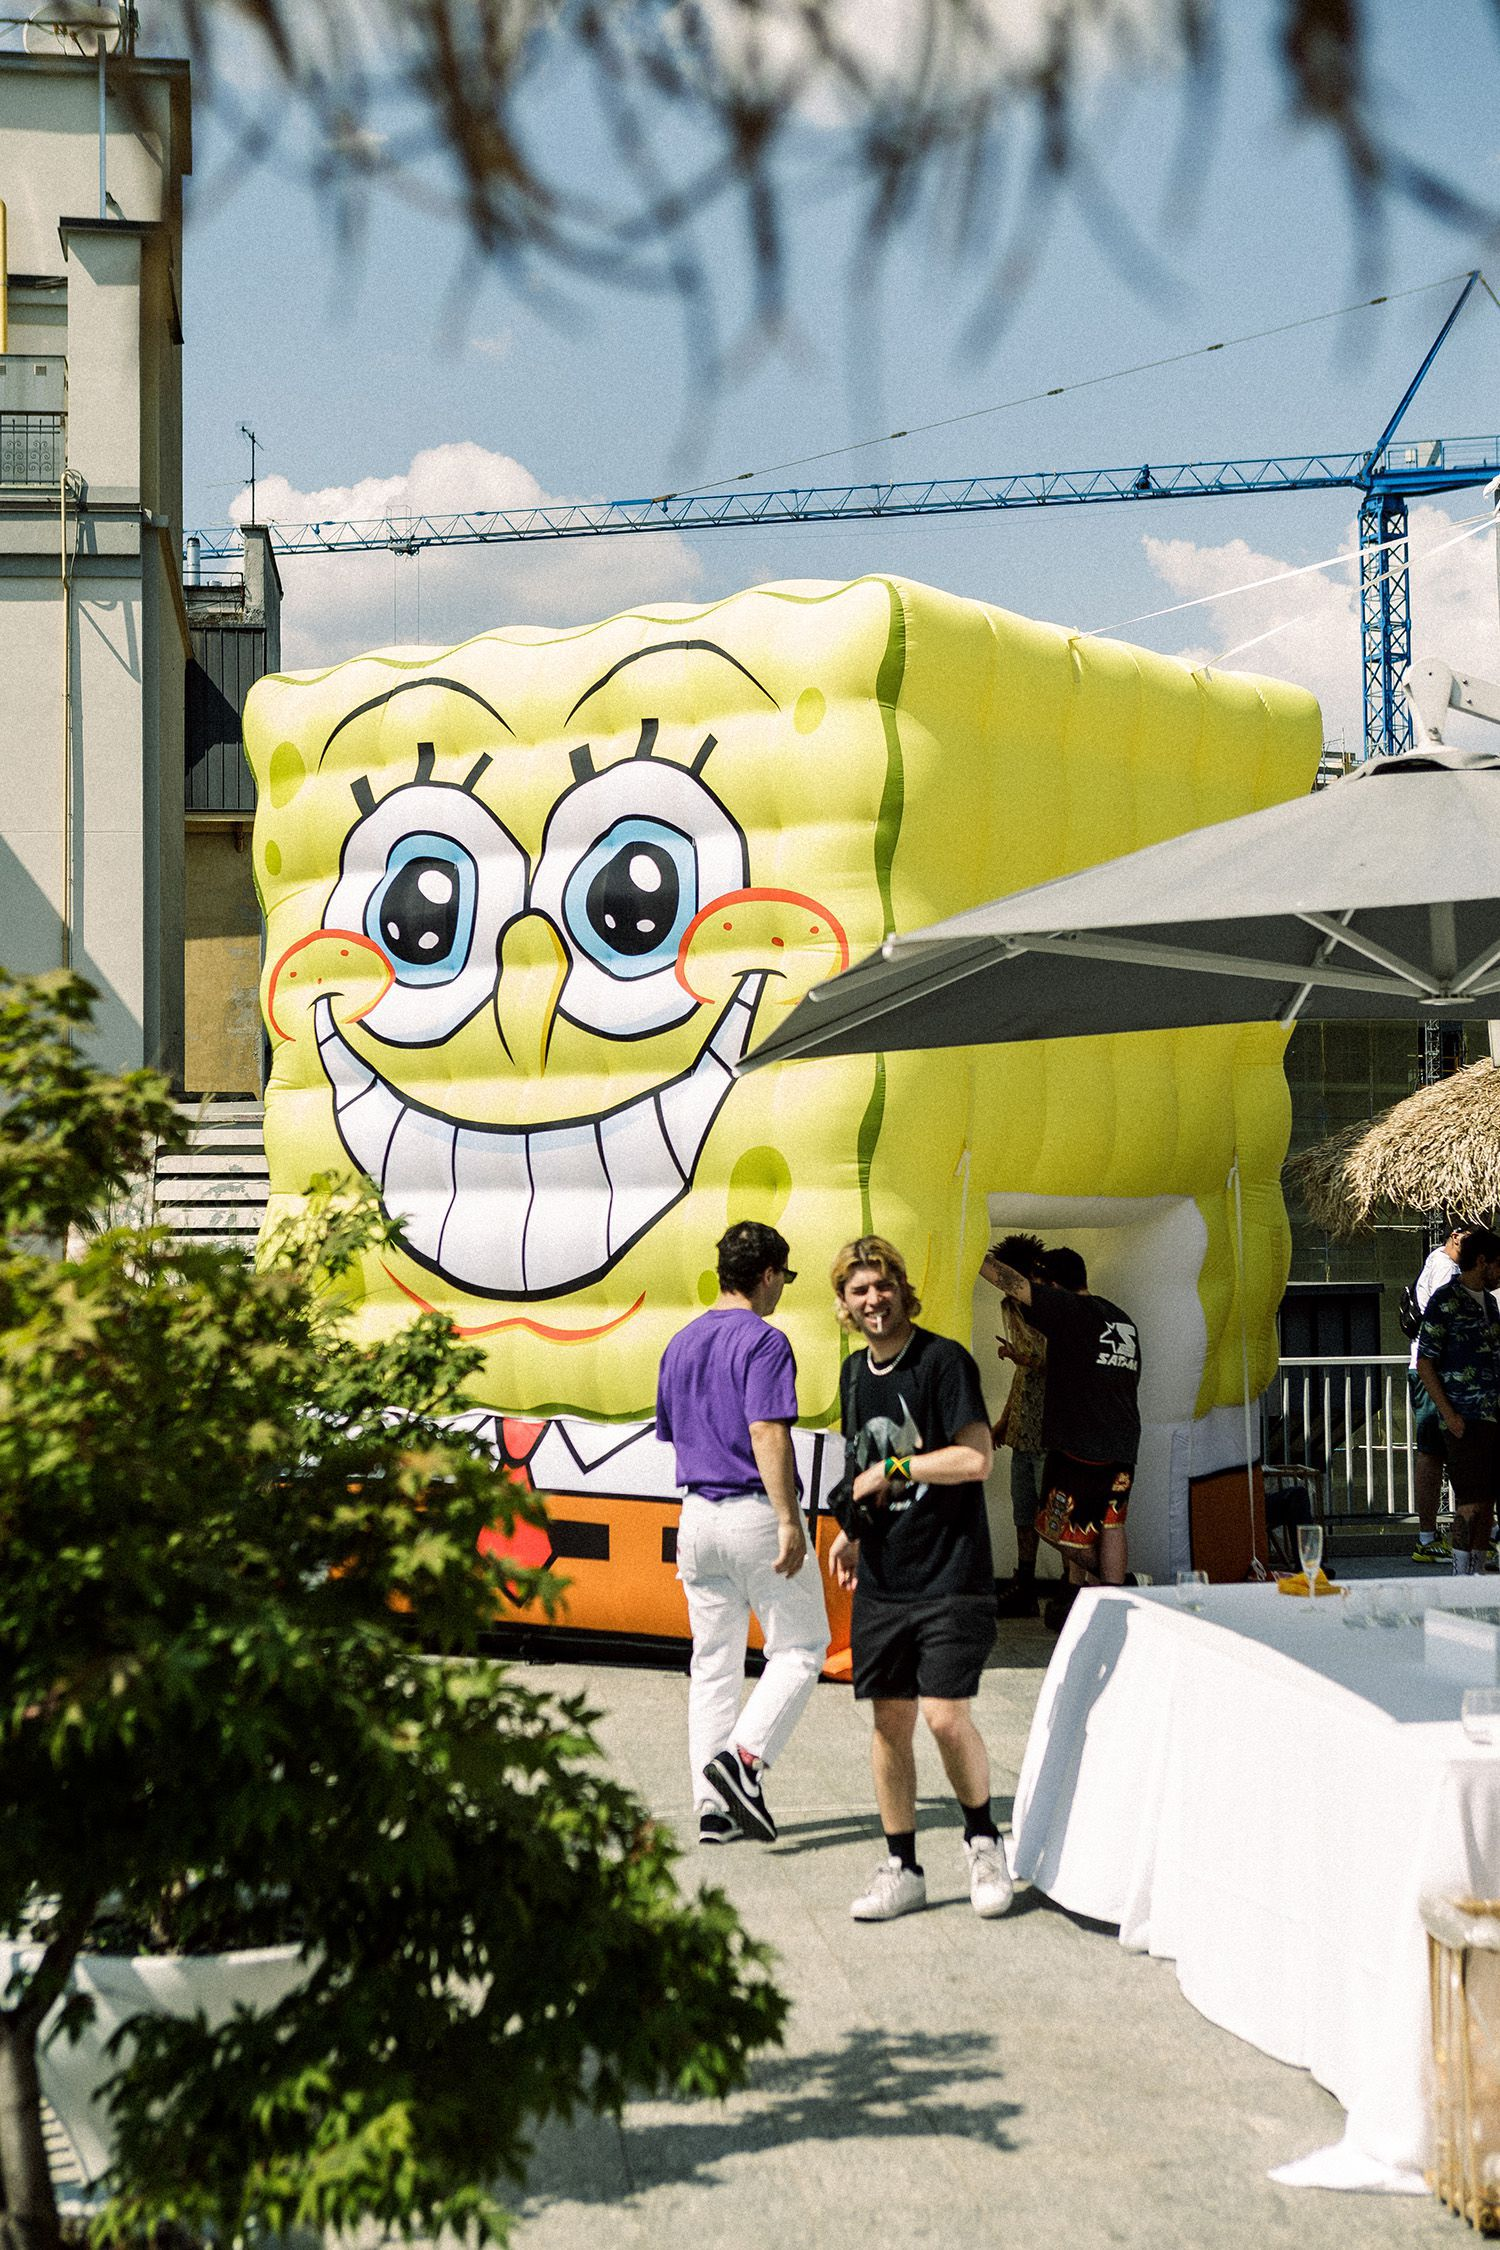 Octopus Brand x Spongebob It's not about winning, it's about Fun!